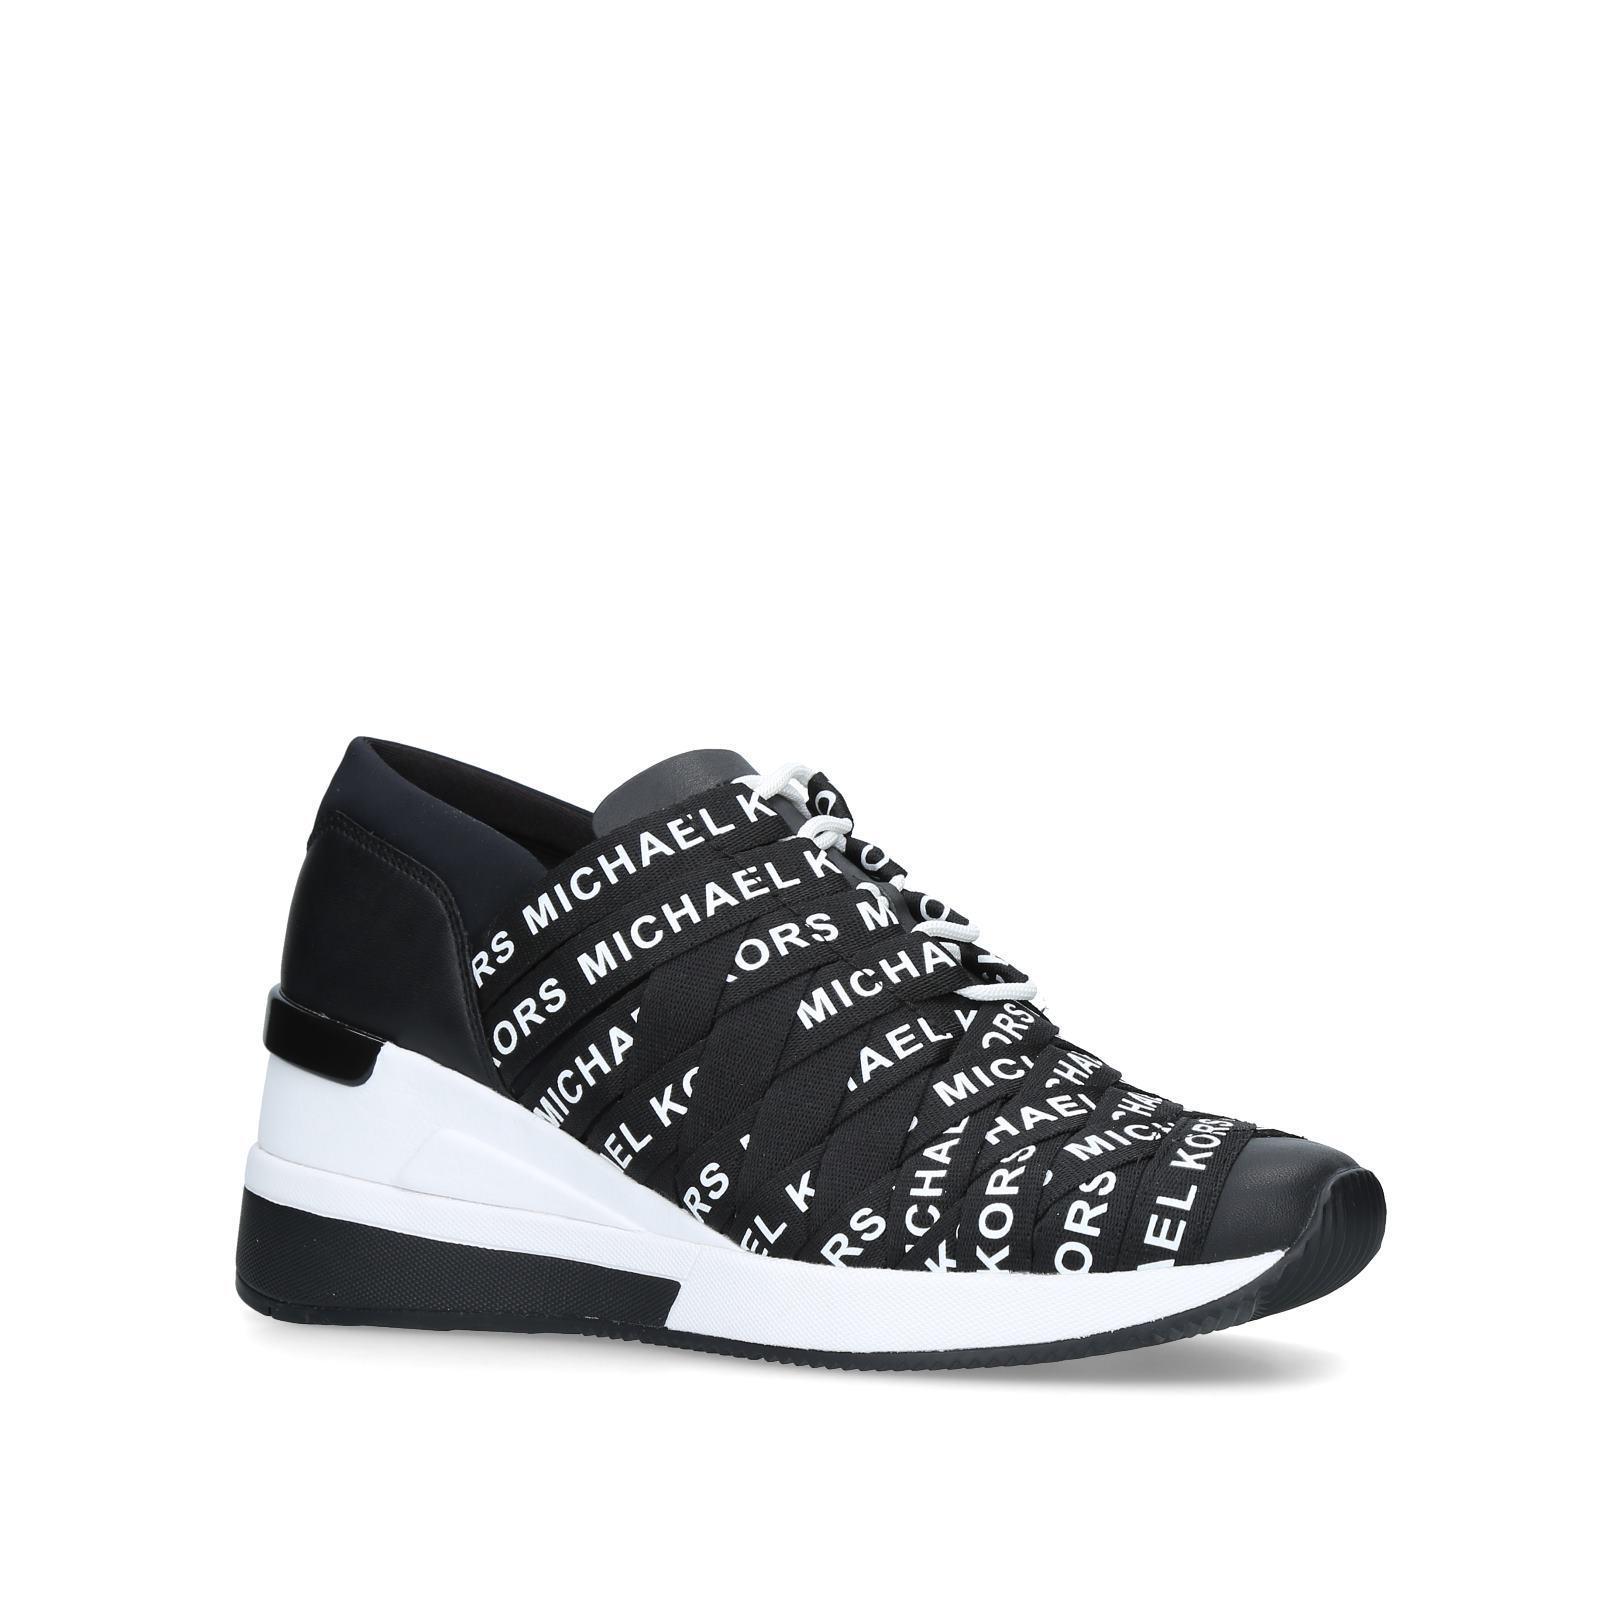 michael kors cydney trainer sneakers